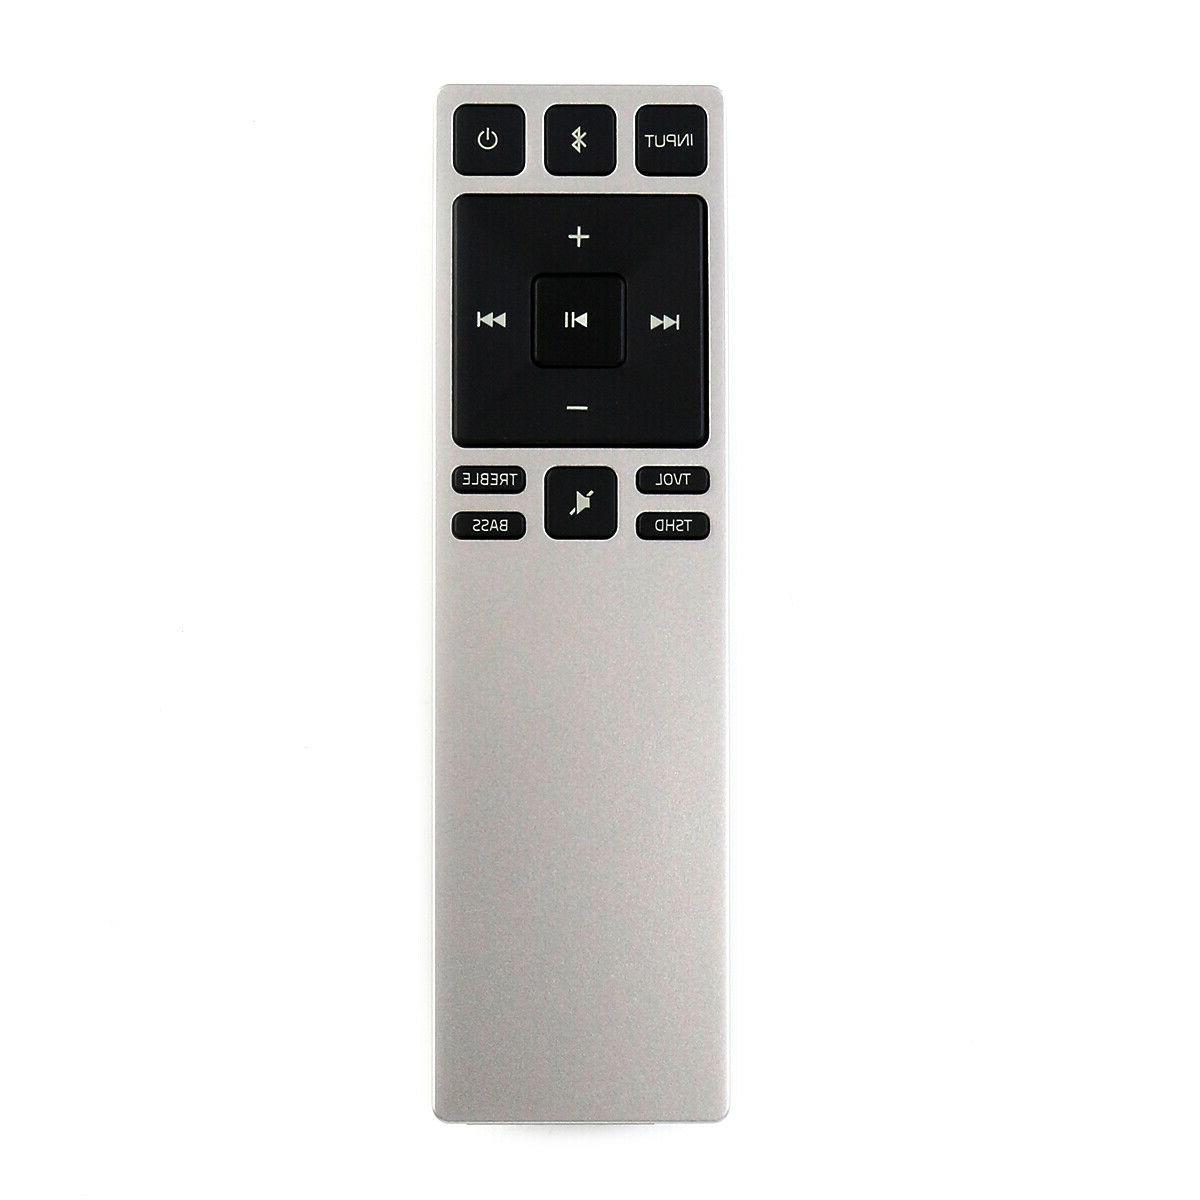 New Remote for Vizio Soundbar S2920W-C0 S3820W-C0 S3821W-C0